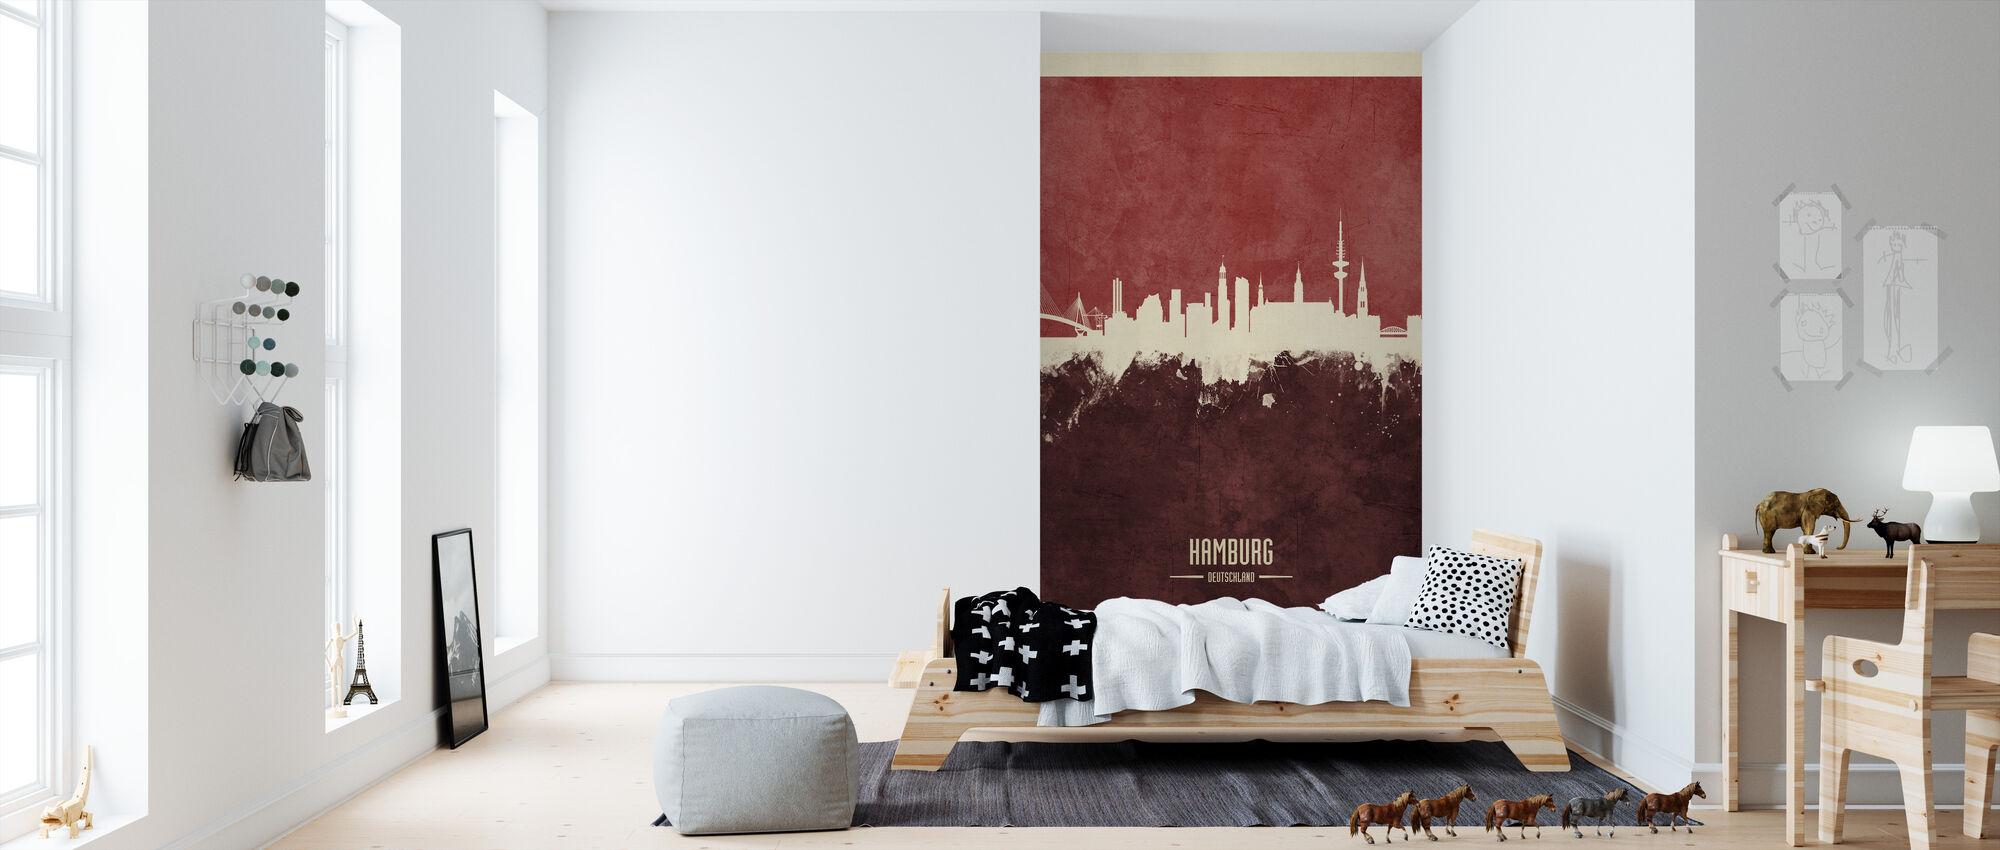 Hamburg Germany Skyline Red - Wallpaper - Kids Room